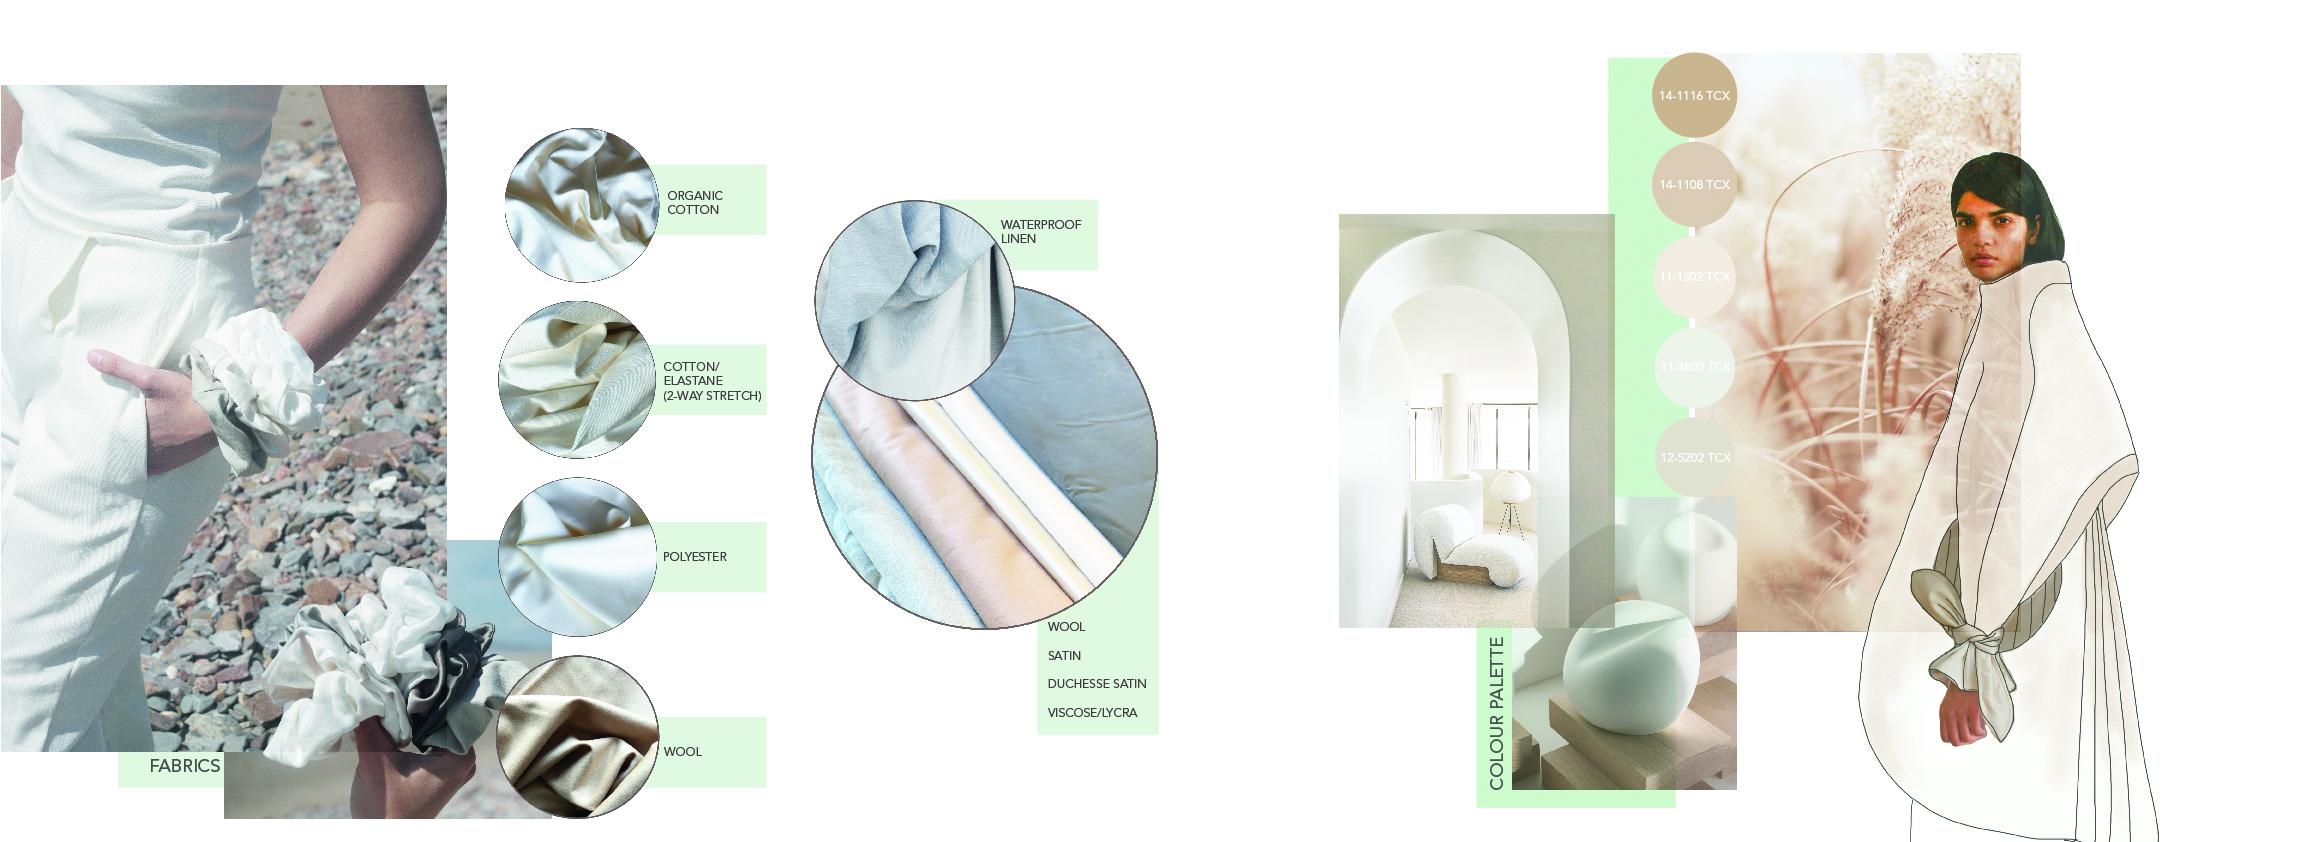 Donata Zawojak_2149218_assignsubmission_file_3 fabrics and colour palette